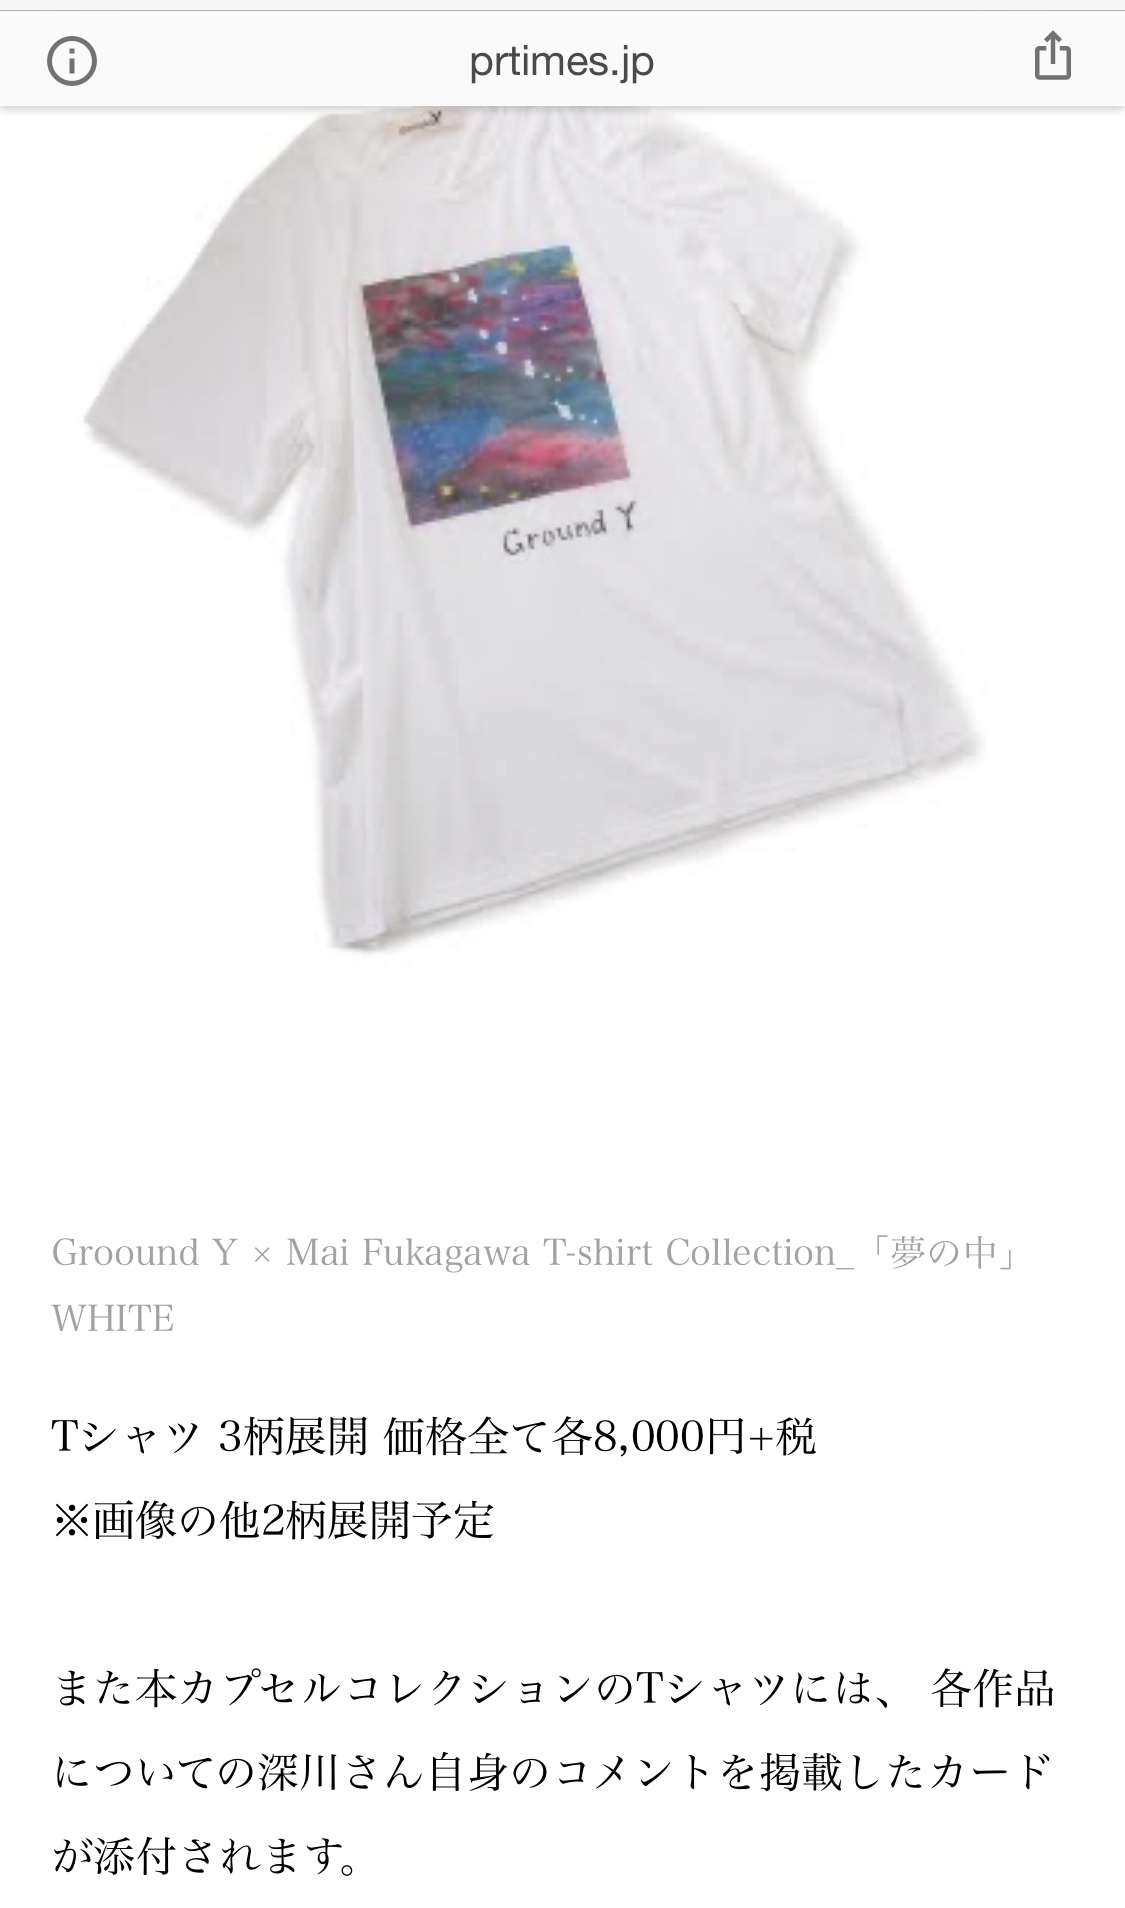 Ground Y × Mai Fukagawa2